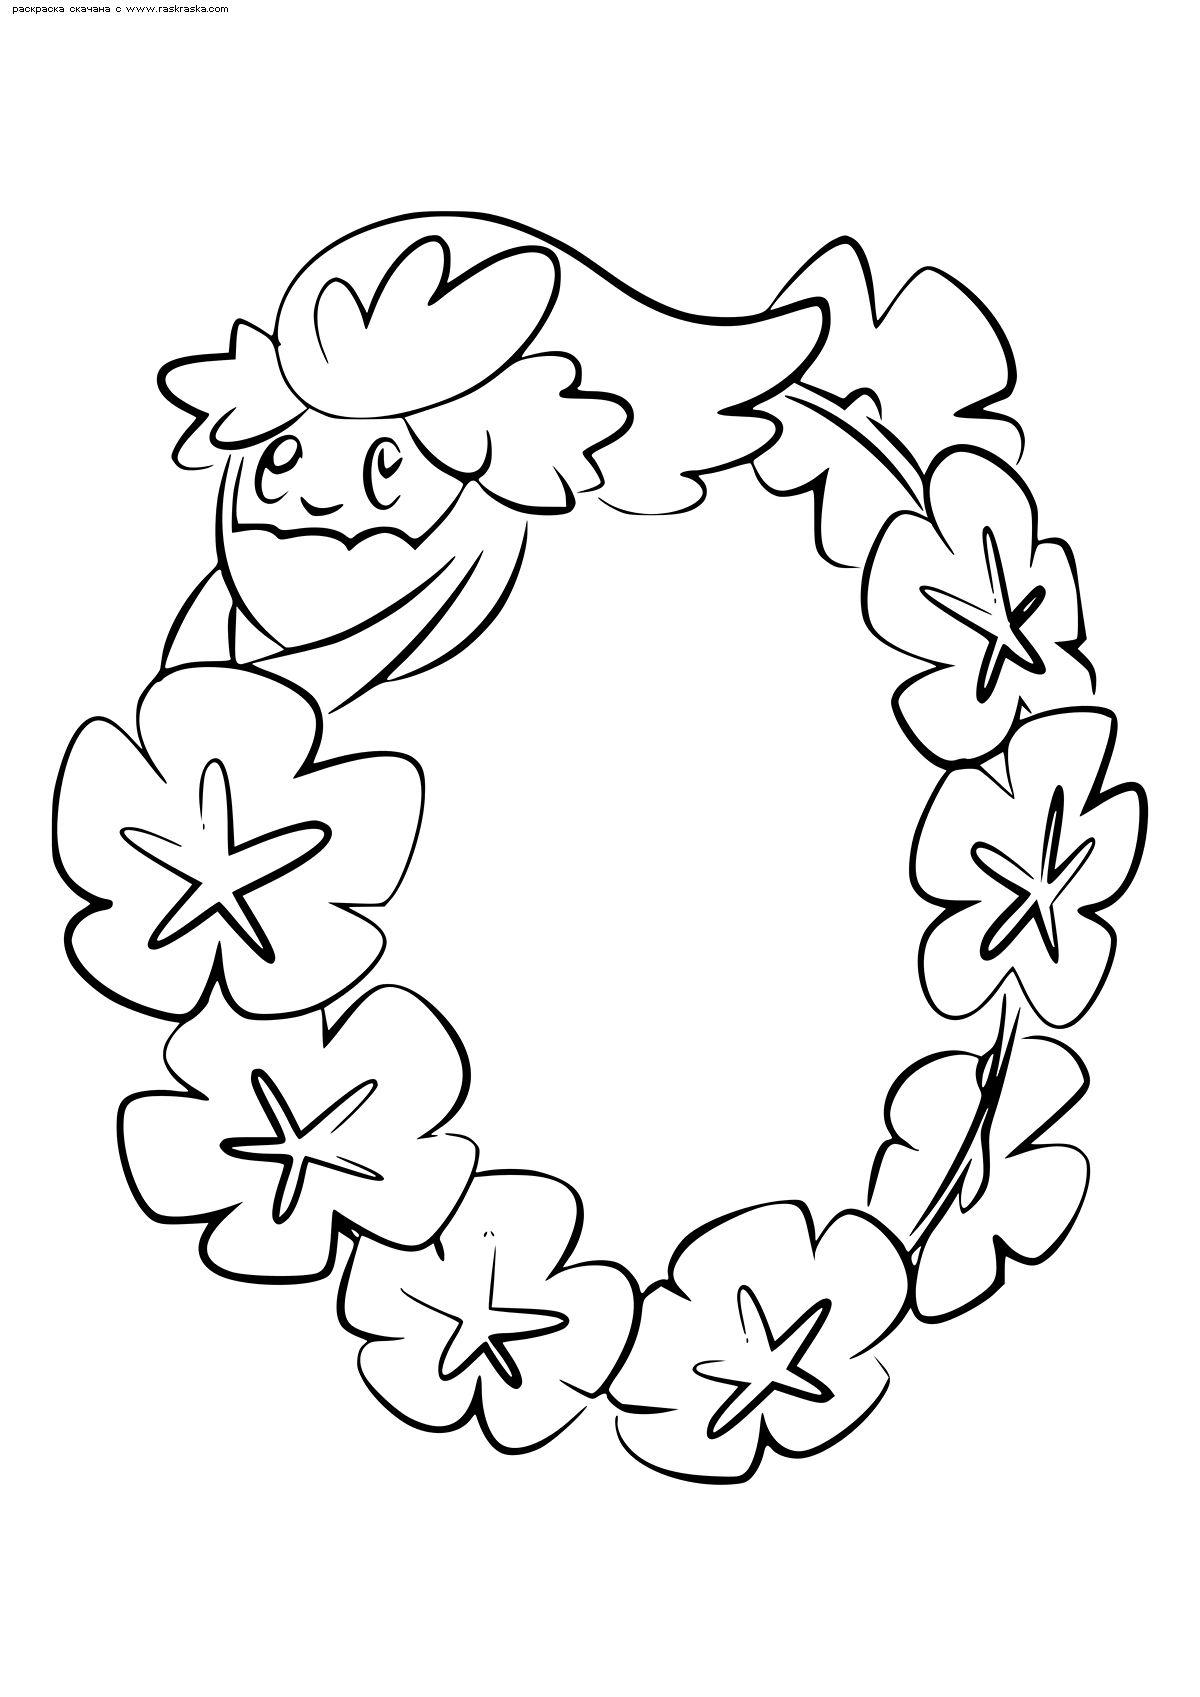 Раскраска Покемон Комфи (Comfey). Раскраска Покемон